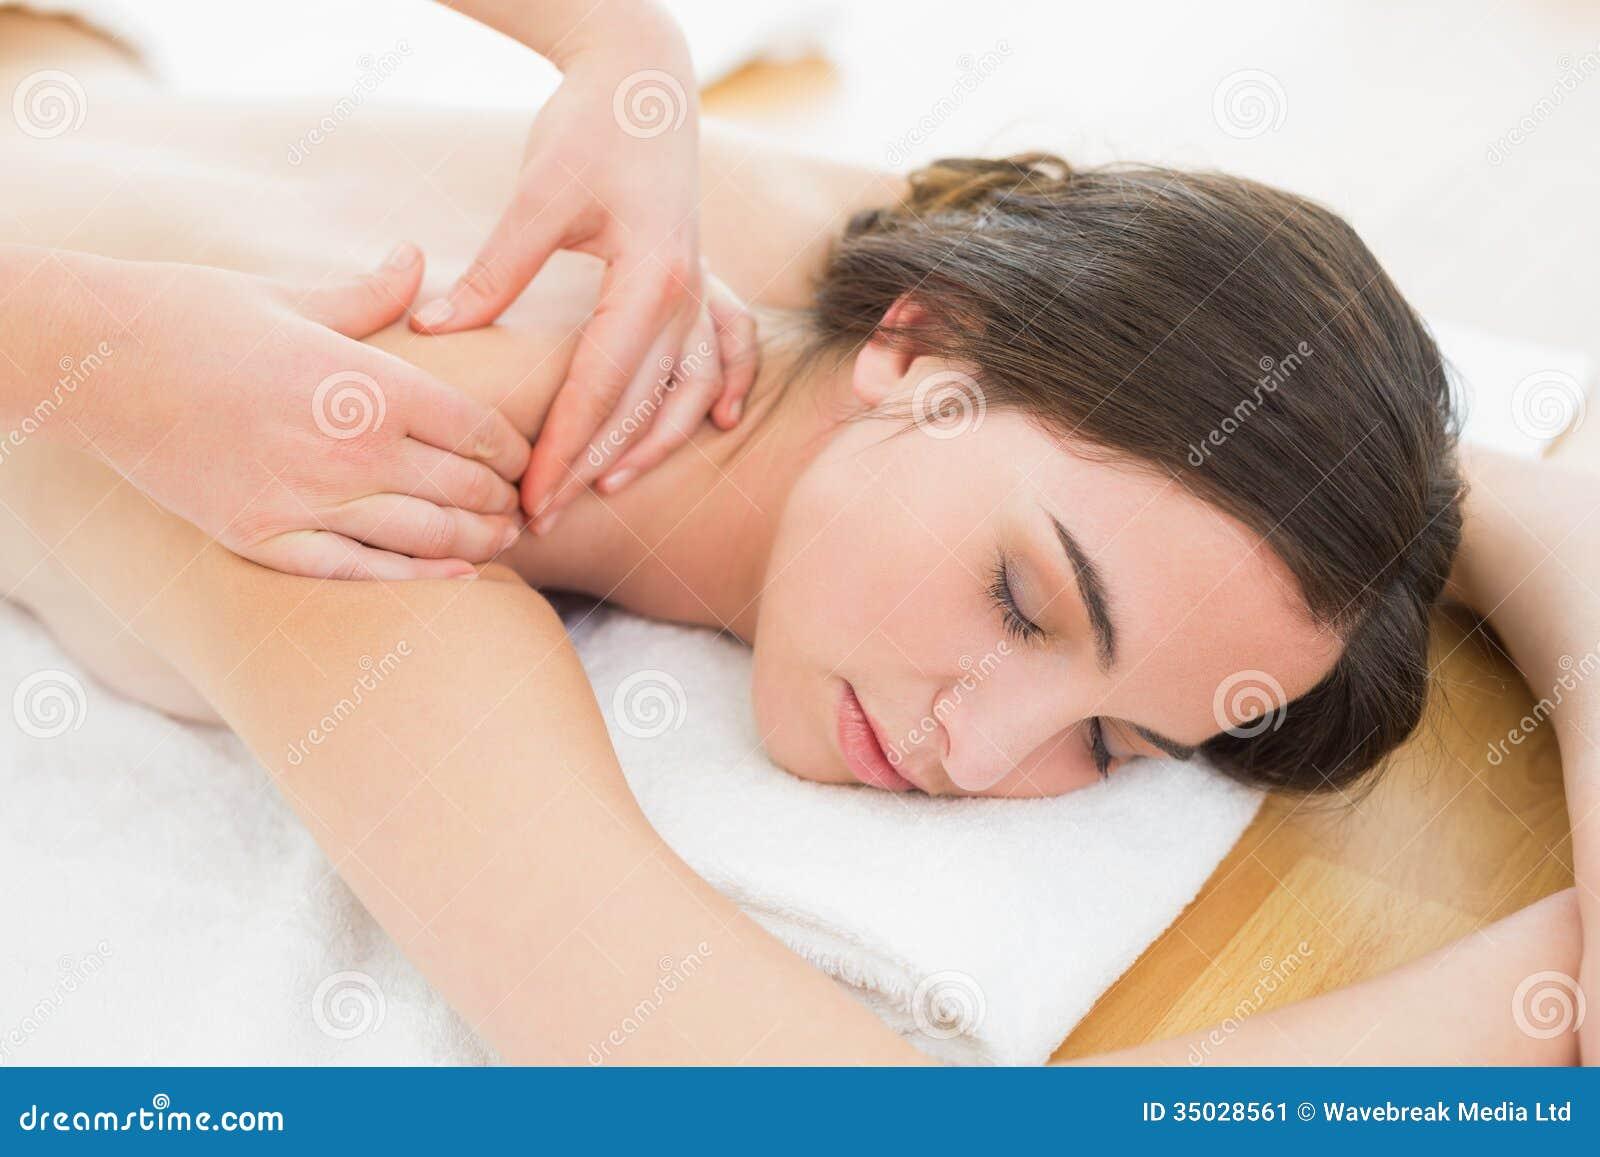 tantra massage gorinchem turkse vrouw neuken